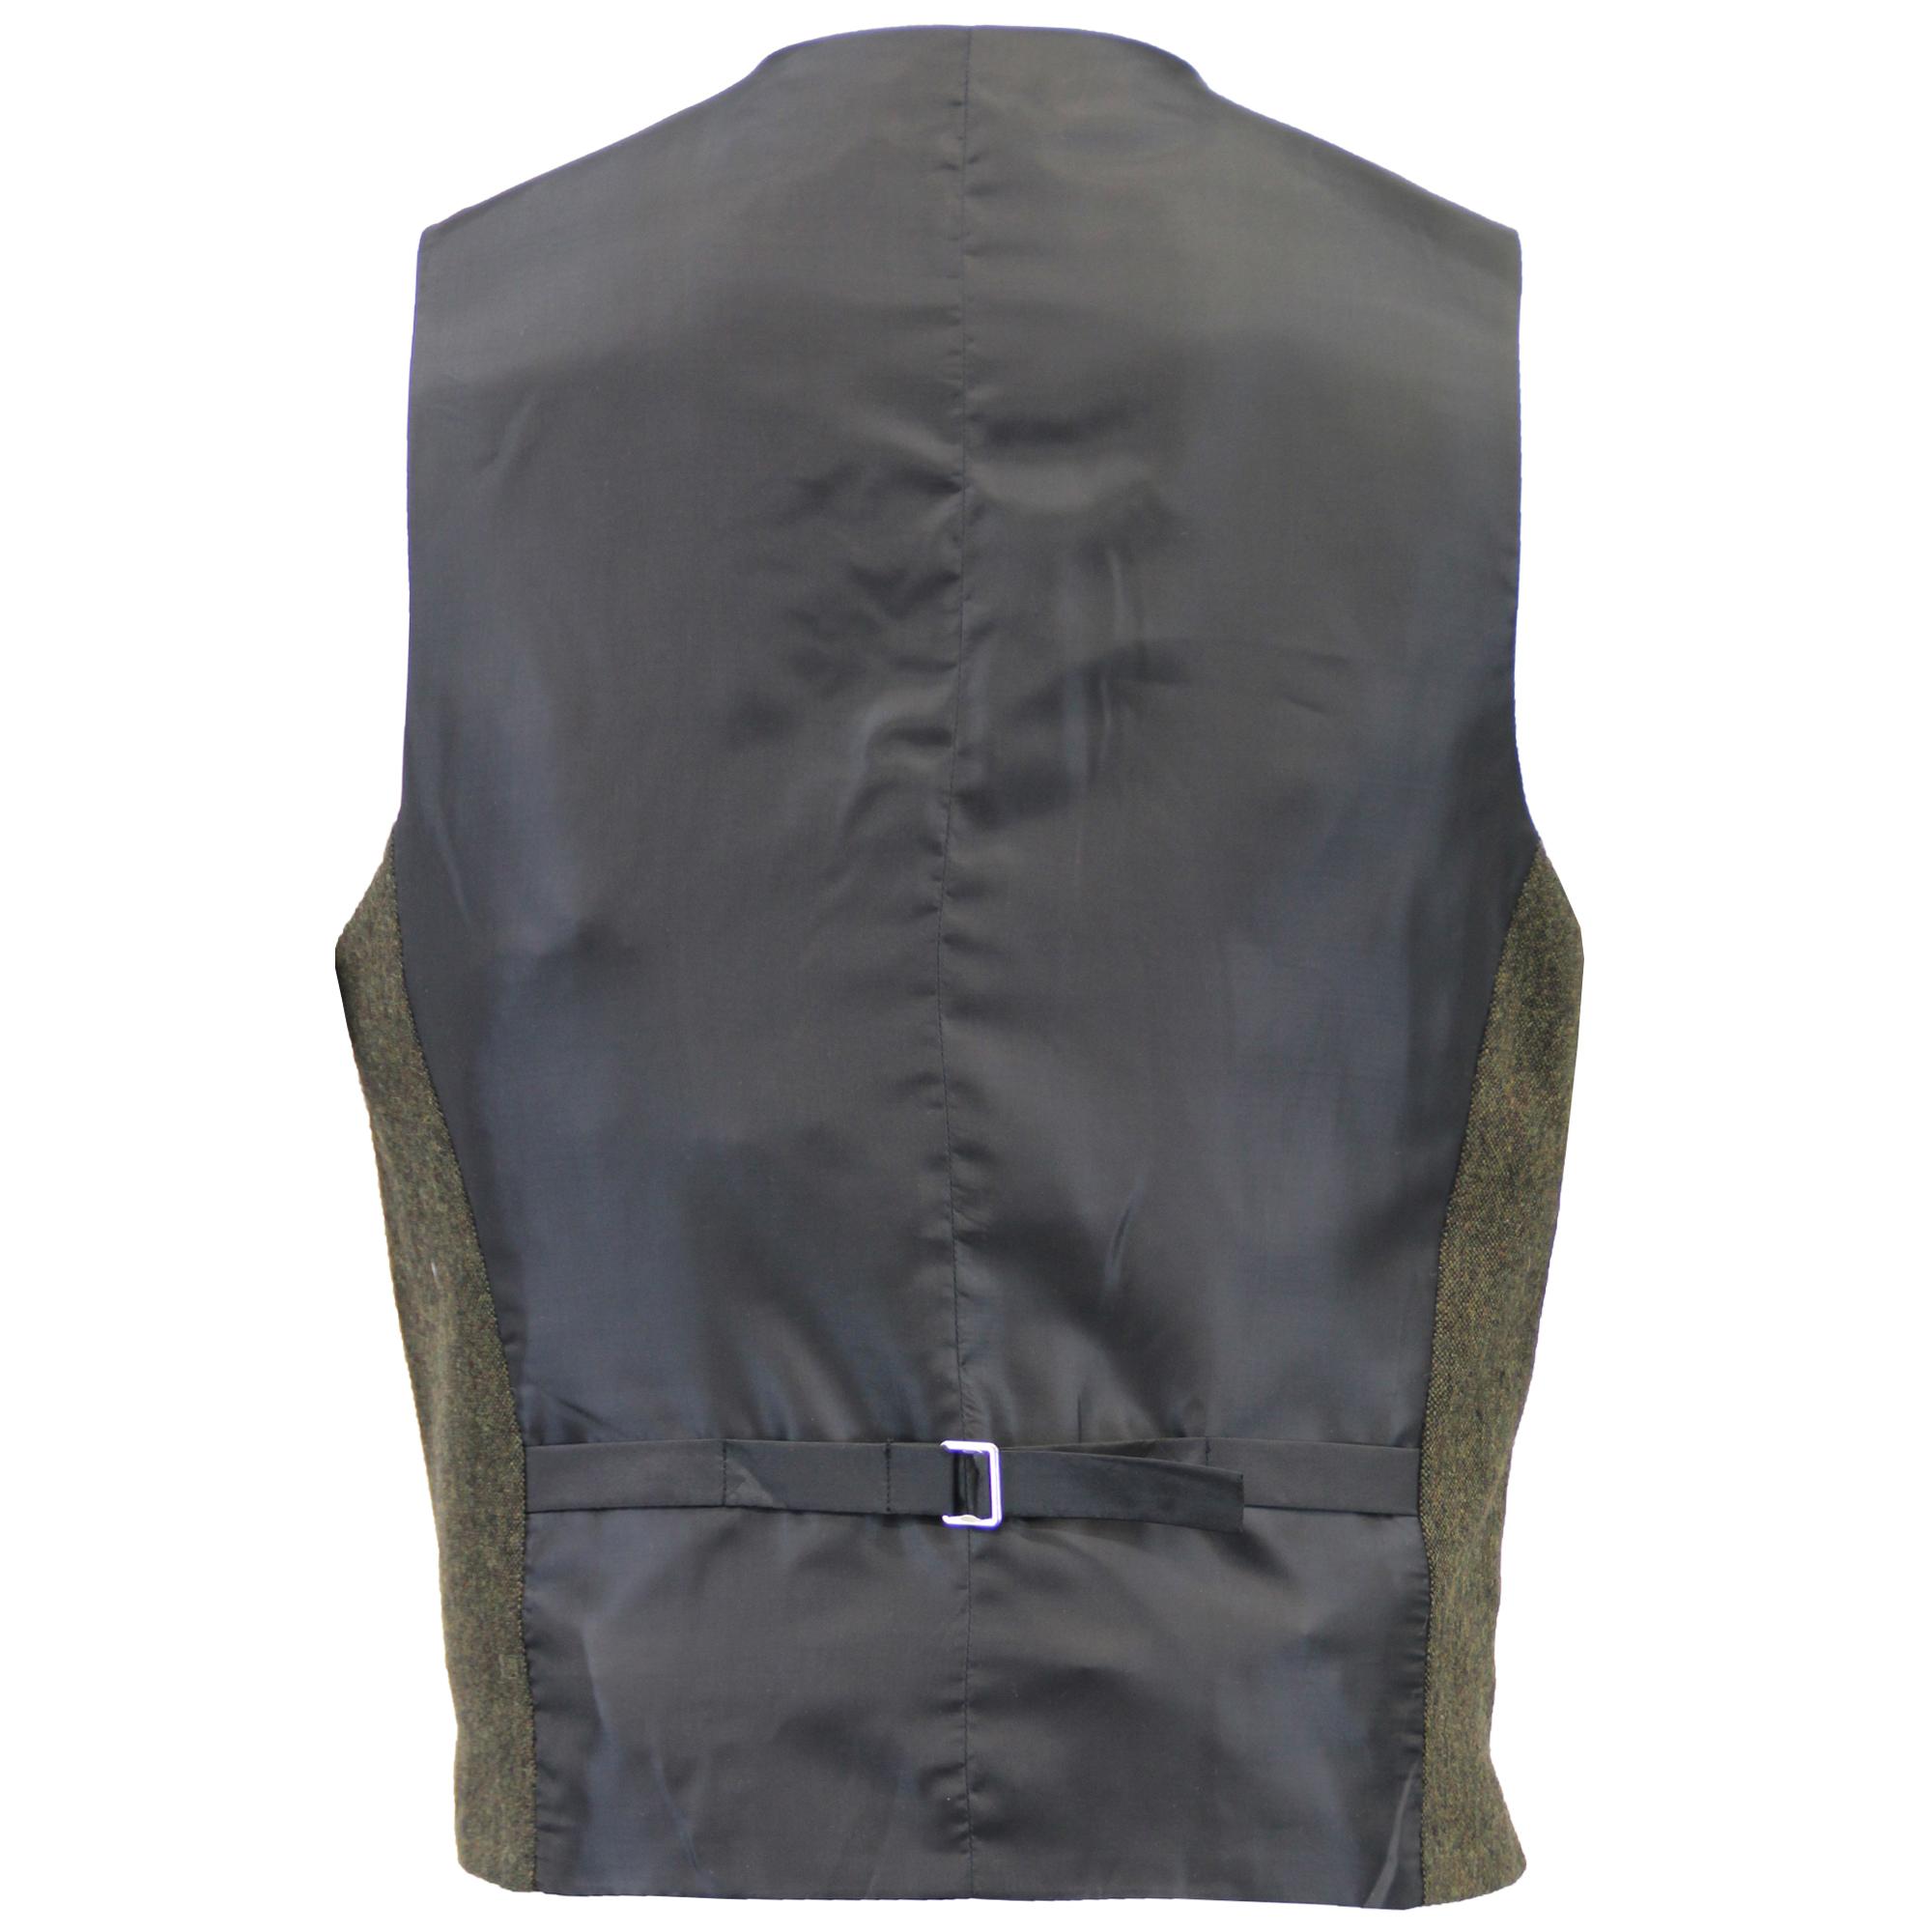 Mezcla-de-lana-para-hombre-3-piezas-trajes-mareno-Blazer-Chaqueta-pantalones-chaleco-Fiesta-Formal miniatura 22